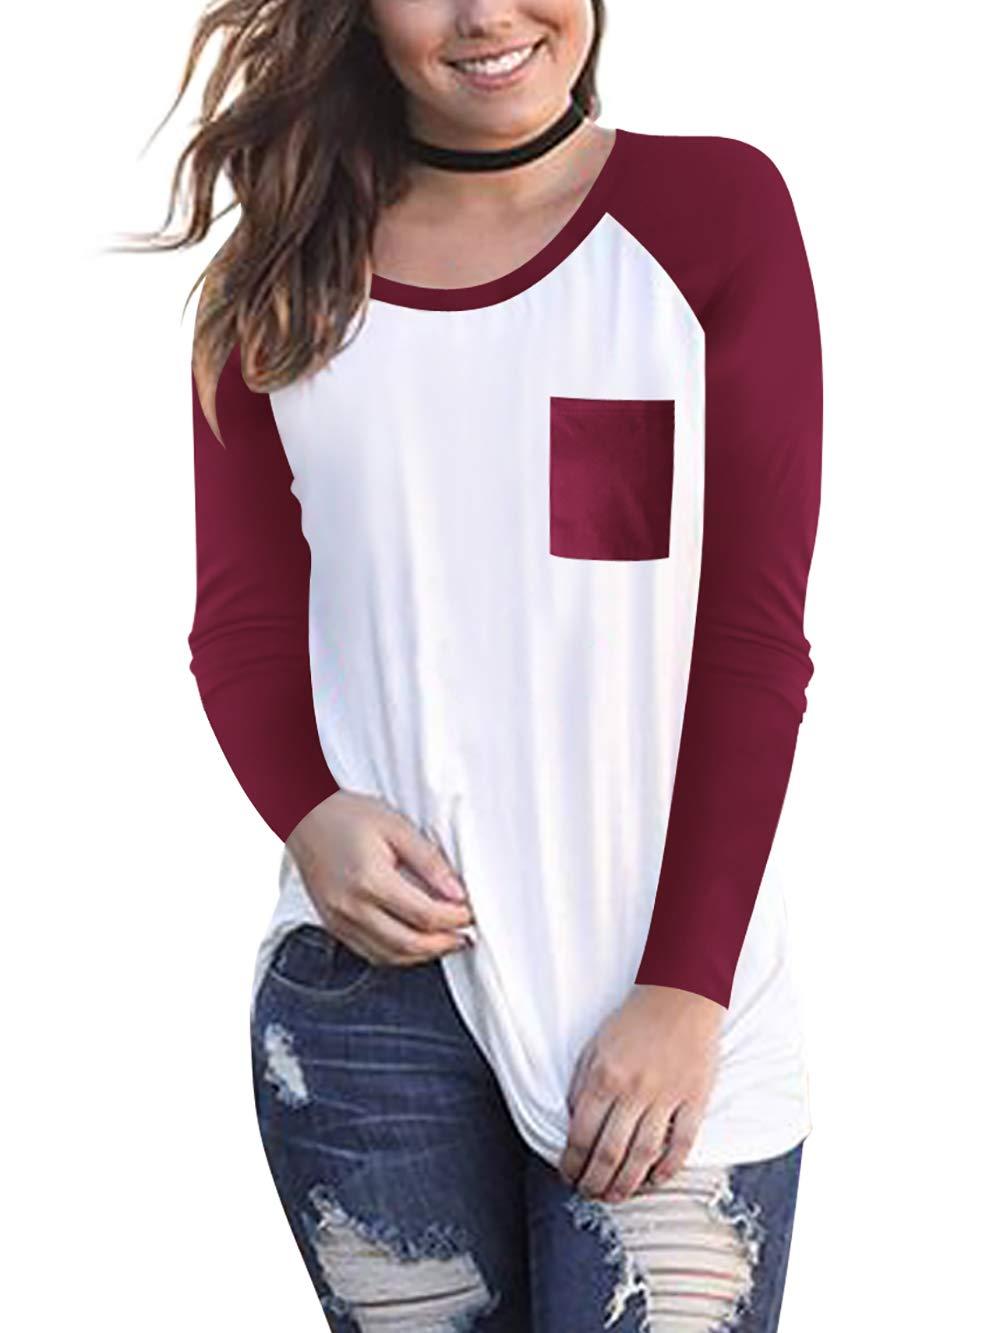 Amoretu Women's Casual Tee Shirts Long Sleeve Raglan Baseball Shirt Pocket Wine Red M